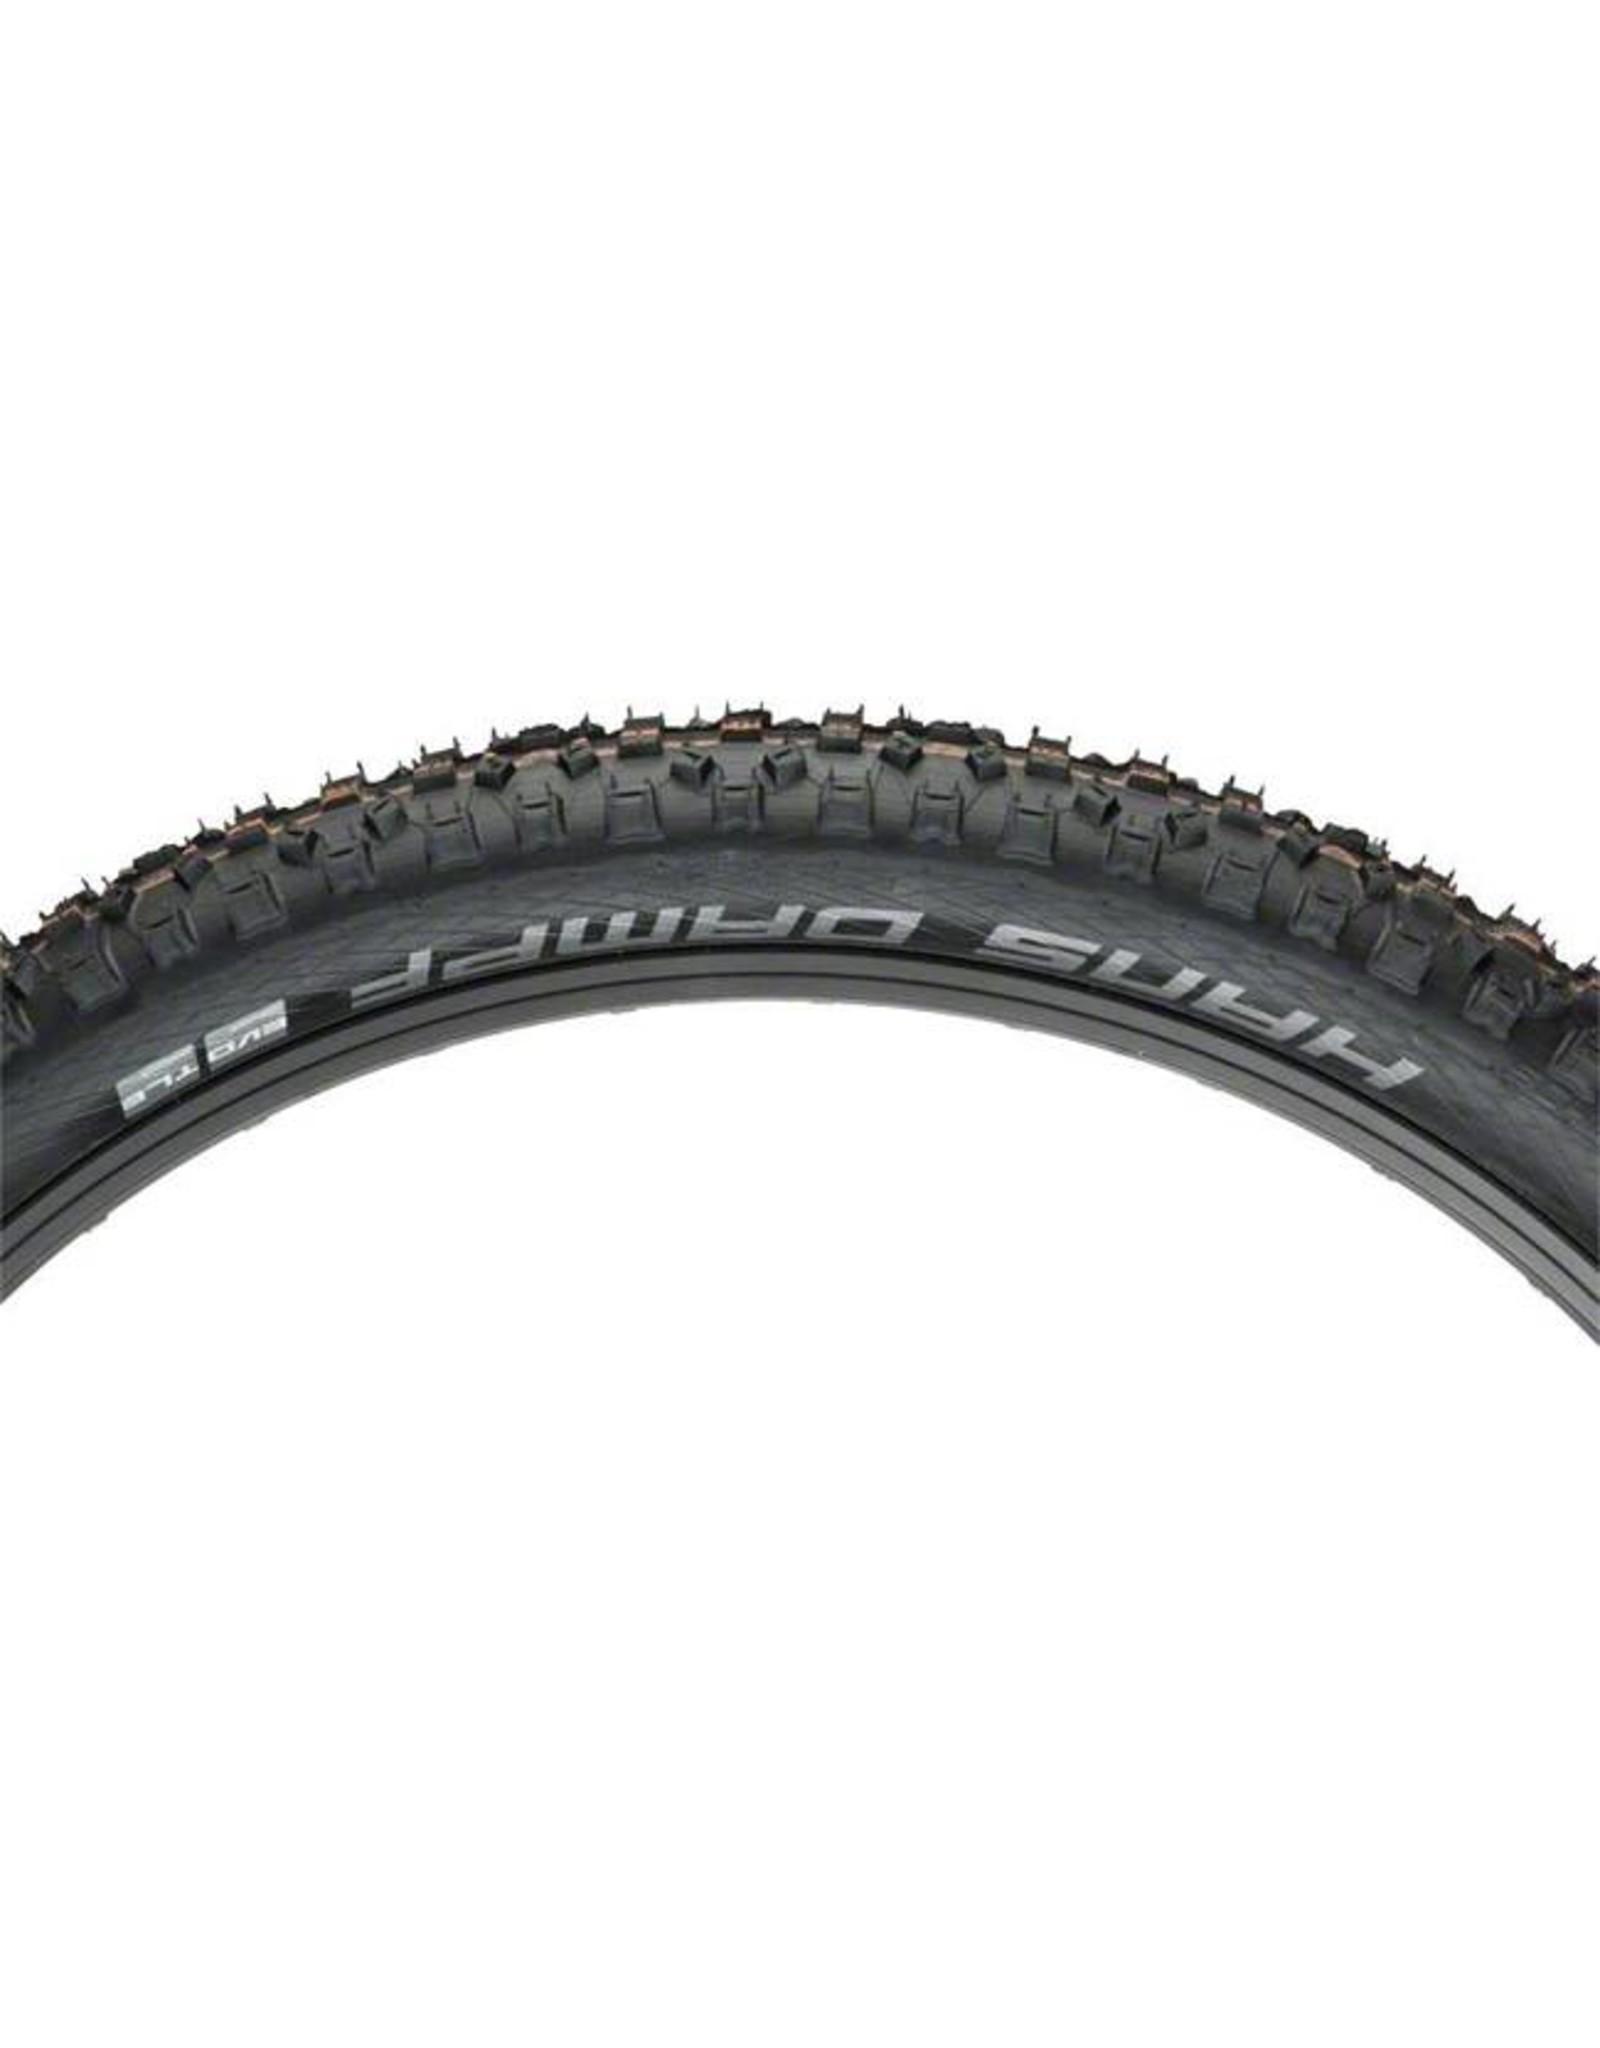 "Schwalbe Schwalbe Hans Dampf Tire: 27.5 x 2.35"", Folding Bead, Evolution Line, Addix Soft Compound, SnakeSkin, Tubeless Easy, Black"